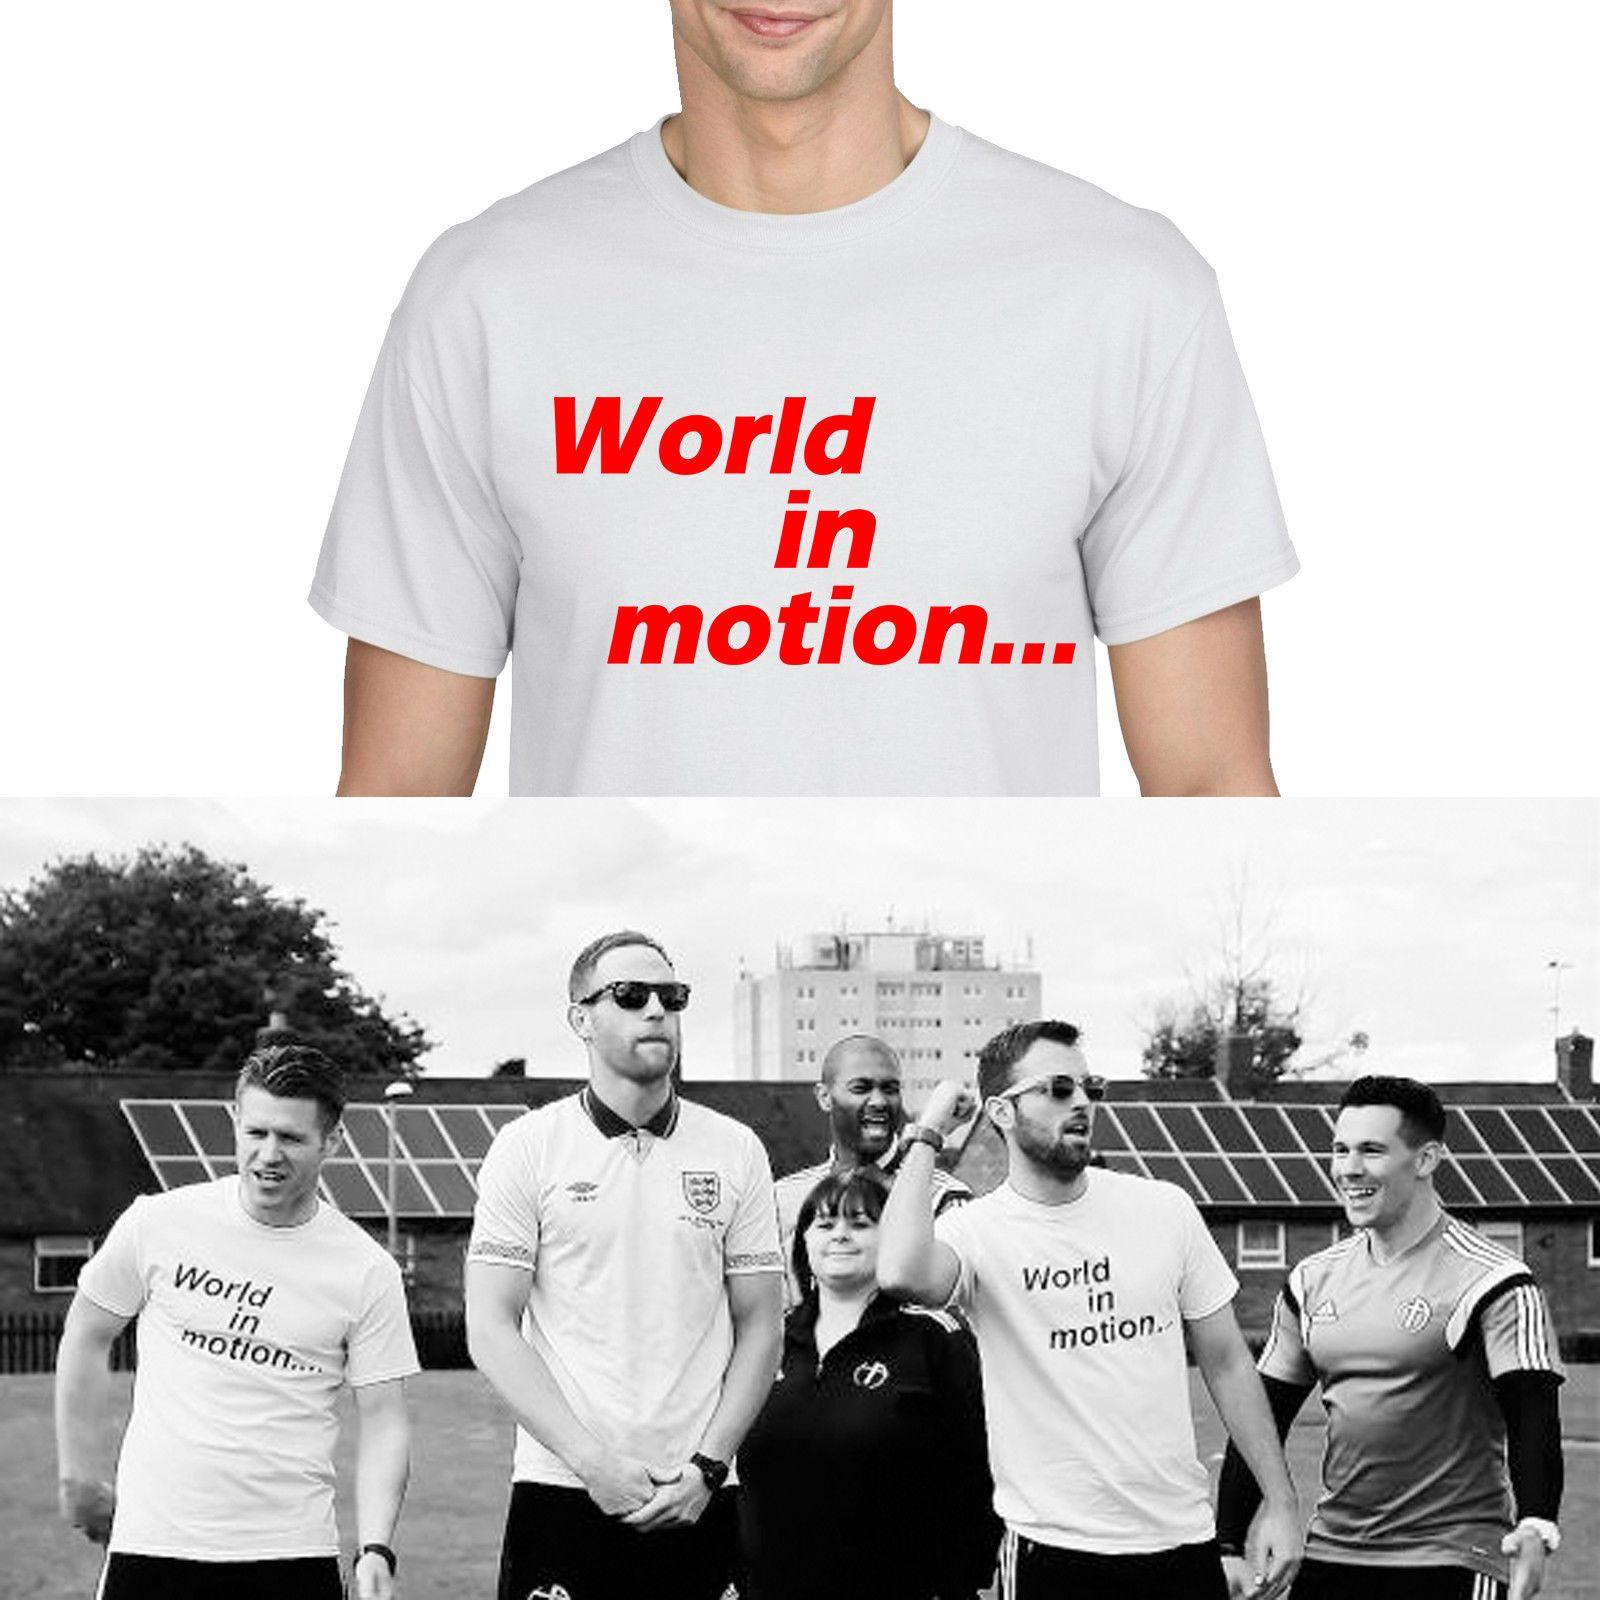 de24a825fb6b98 Großhandel Welt In Bewegung 1990 England Song Kult New Order Fußball Shirt  Barnes 890 Lustige Kostenloser Versand Unisex Casual Tee Geschenk Von  Tshirtsinc, ...